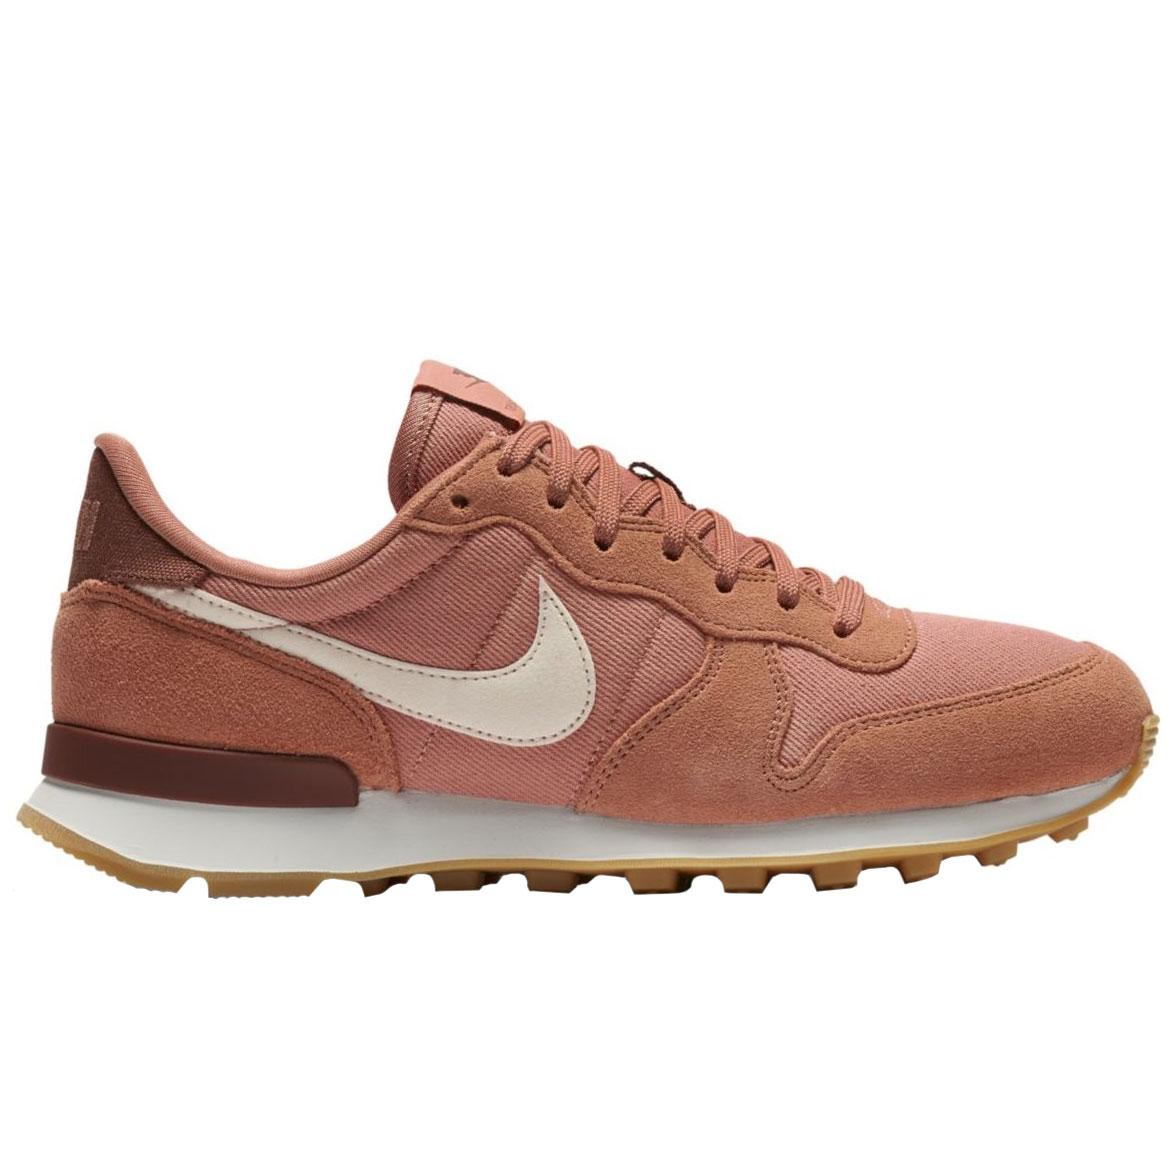 Nike WMNS Internationalist Damen Sneaker terra blush 828407 210 | Sporthaus Marquardt Online Shop für Sportbekleidung, Mode & Schuhe